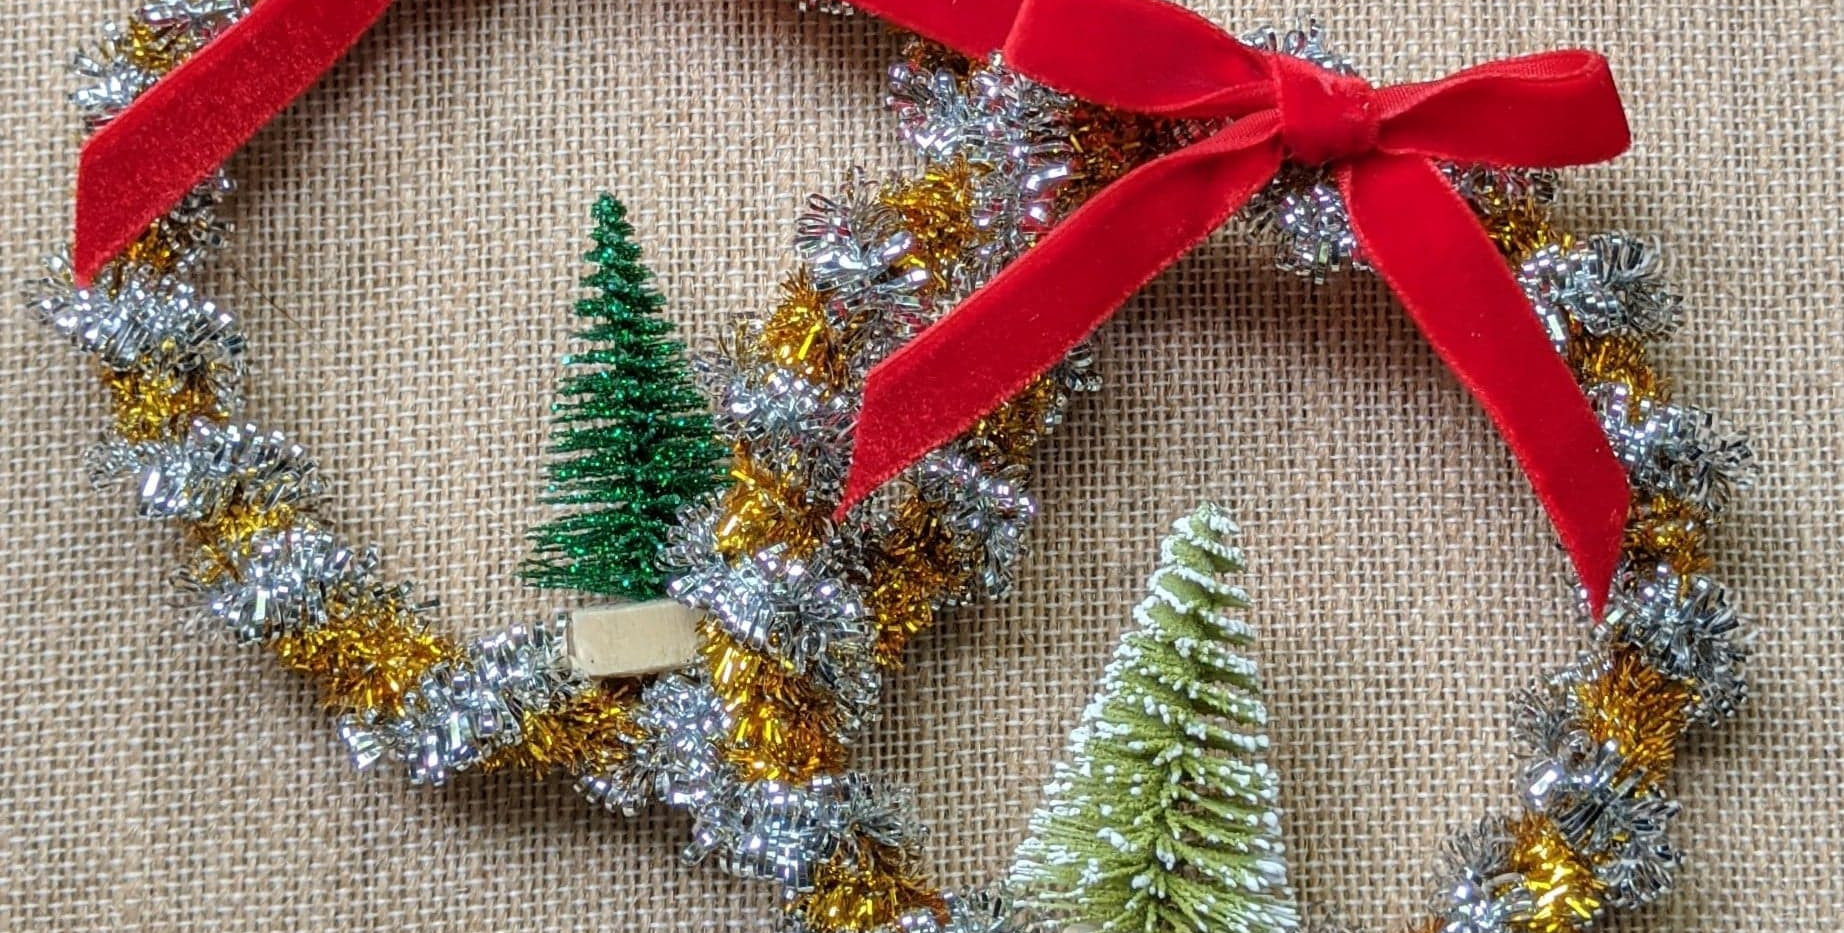 Marais Handmade Vintage Style Ornaments